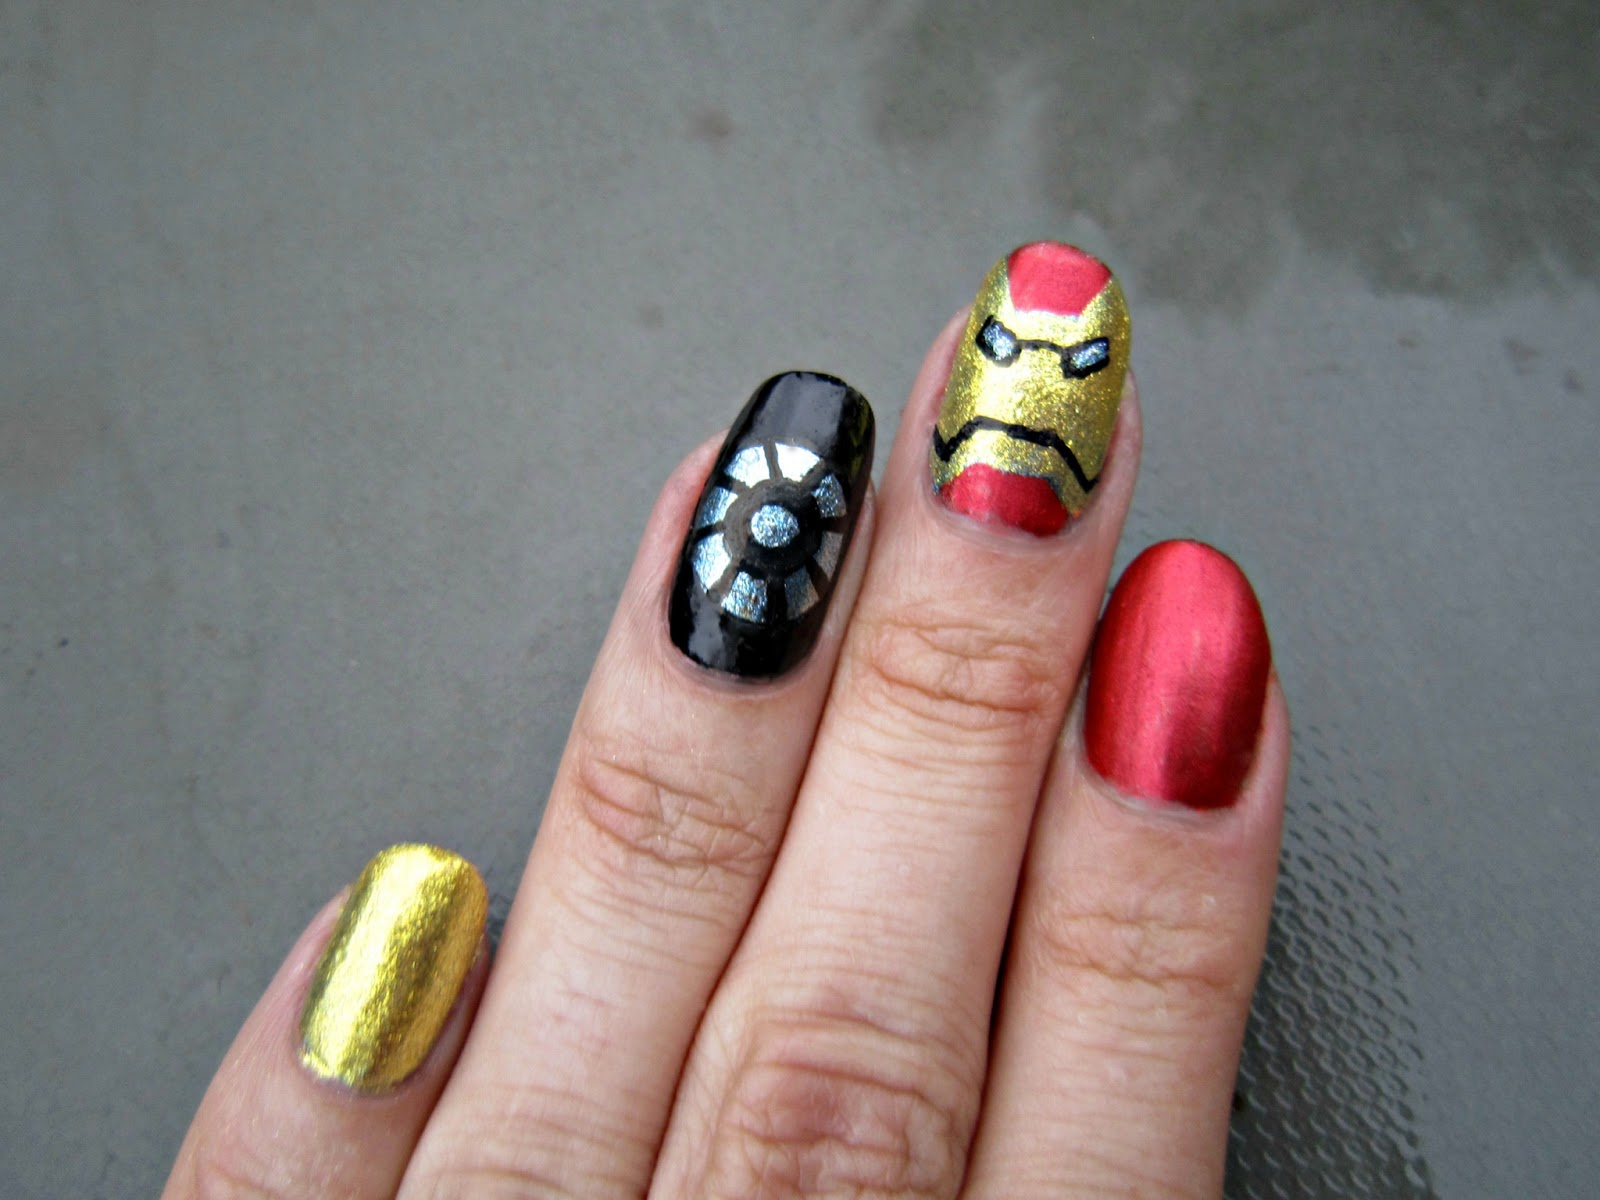 Concrete and Nail Polish: Iron Man Nails!